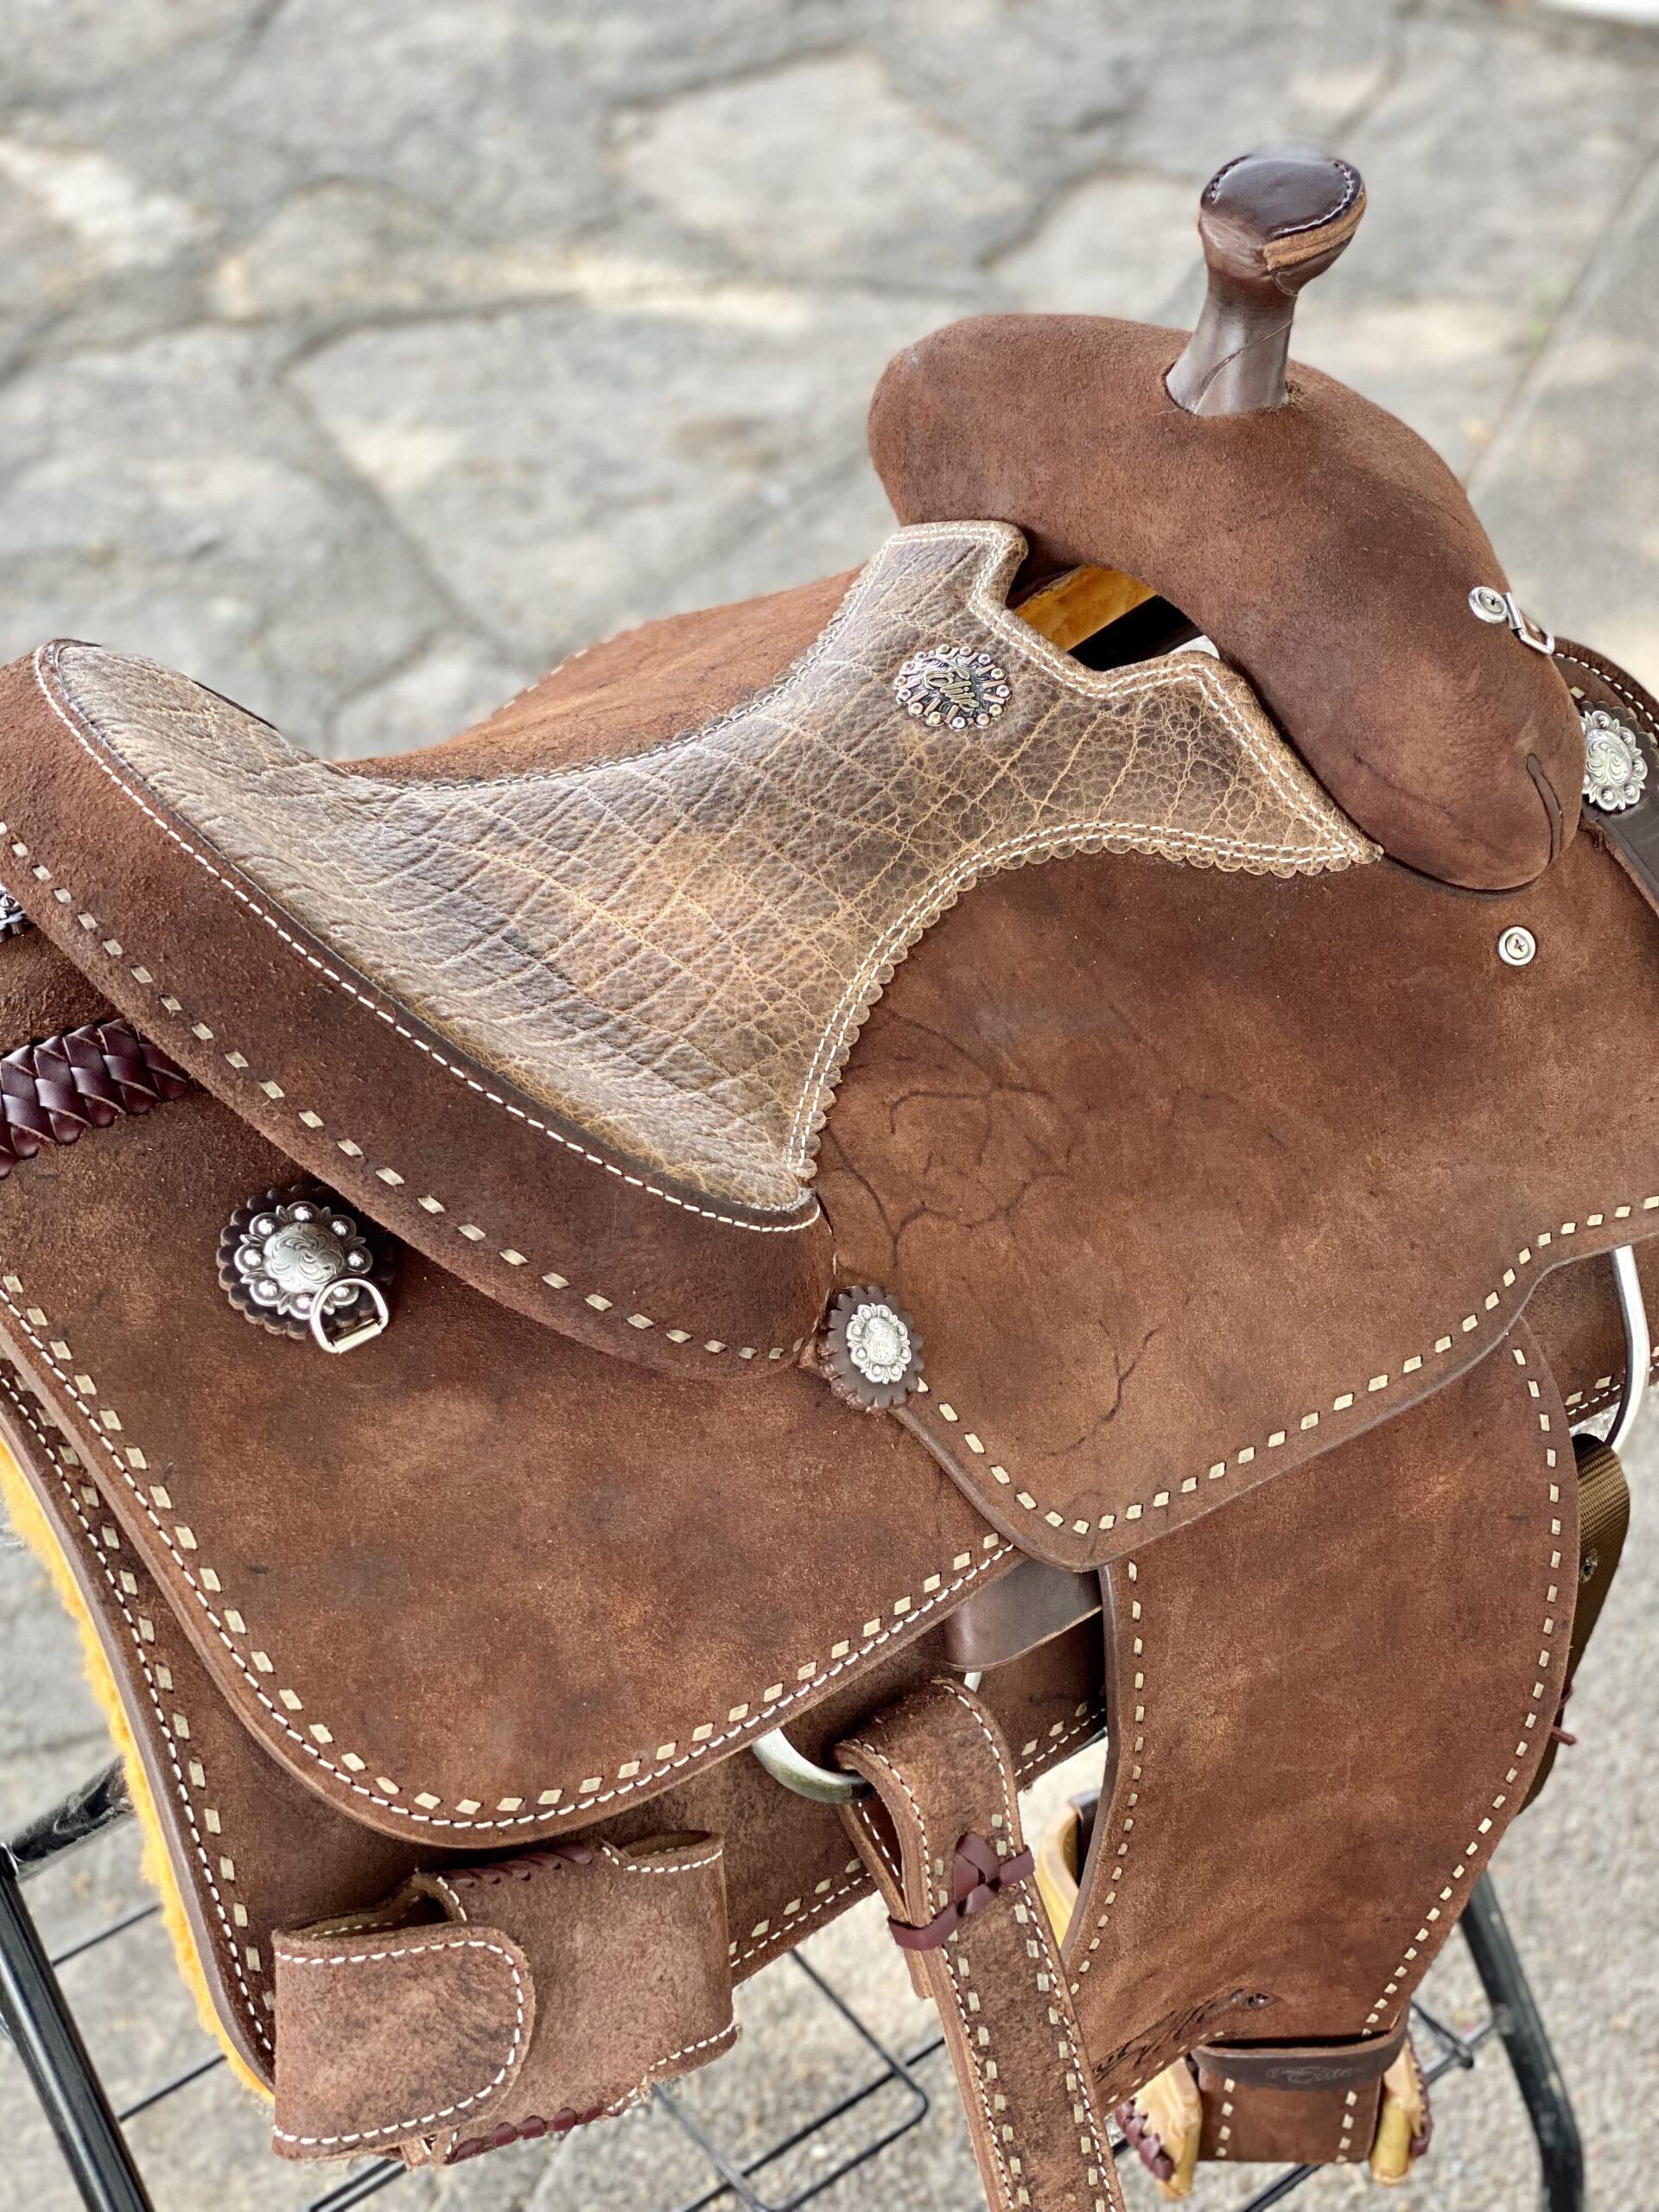 <b>15.5in</b><p>Mike Johnson roper saddle</p>